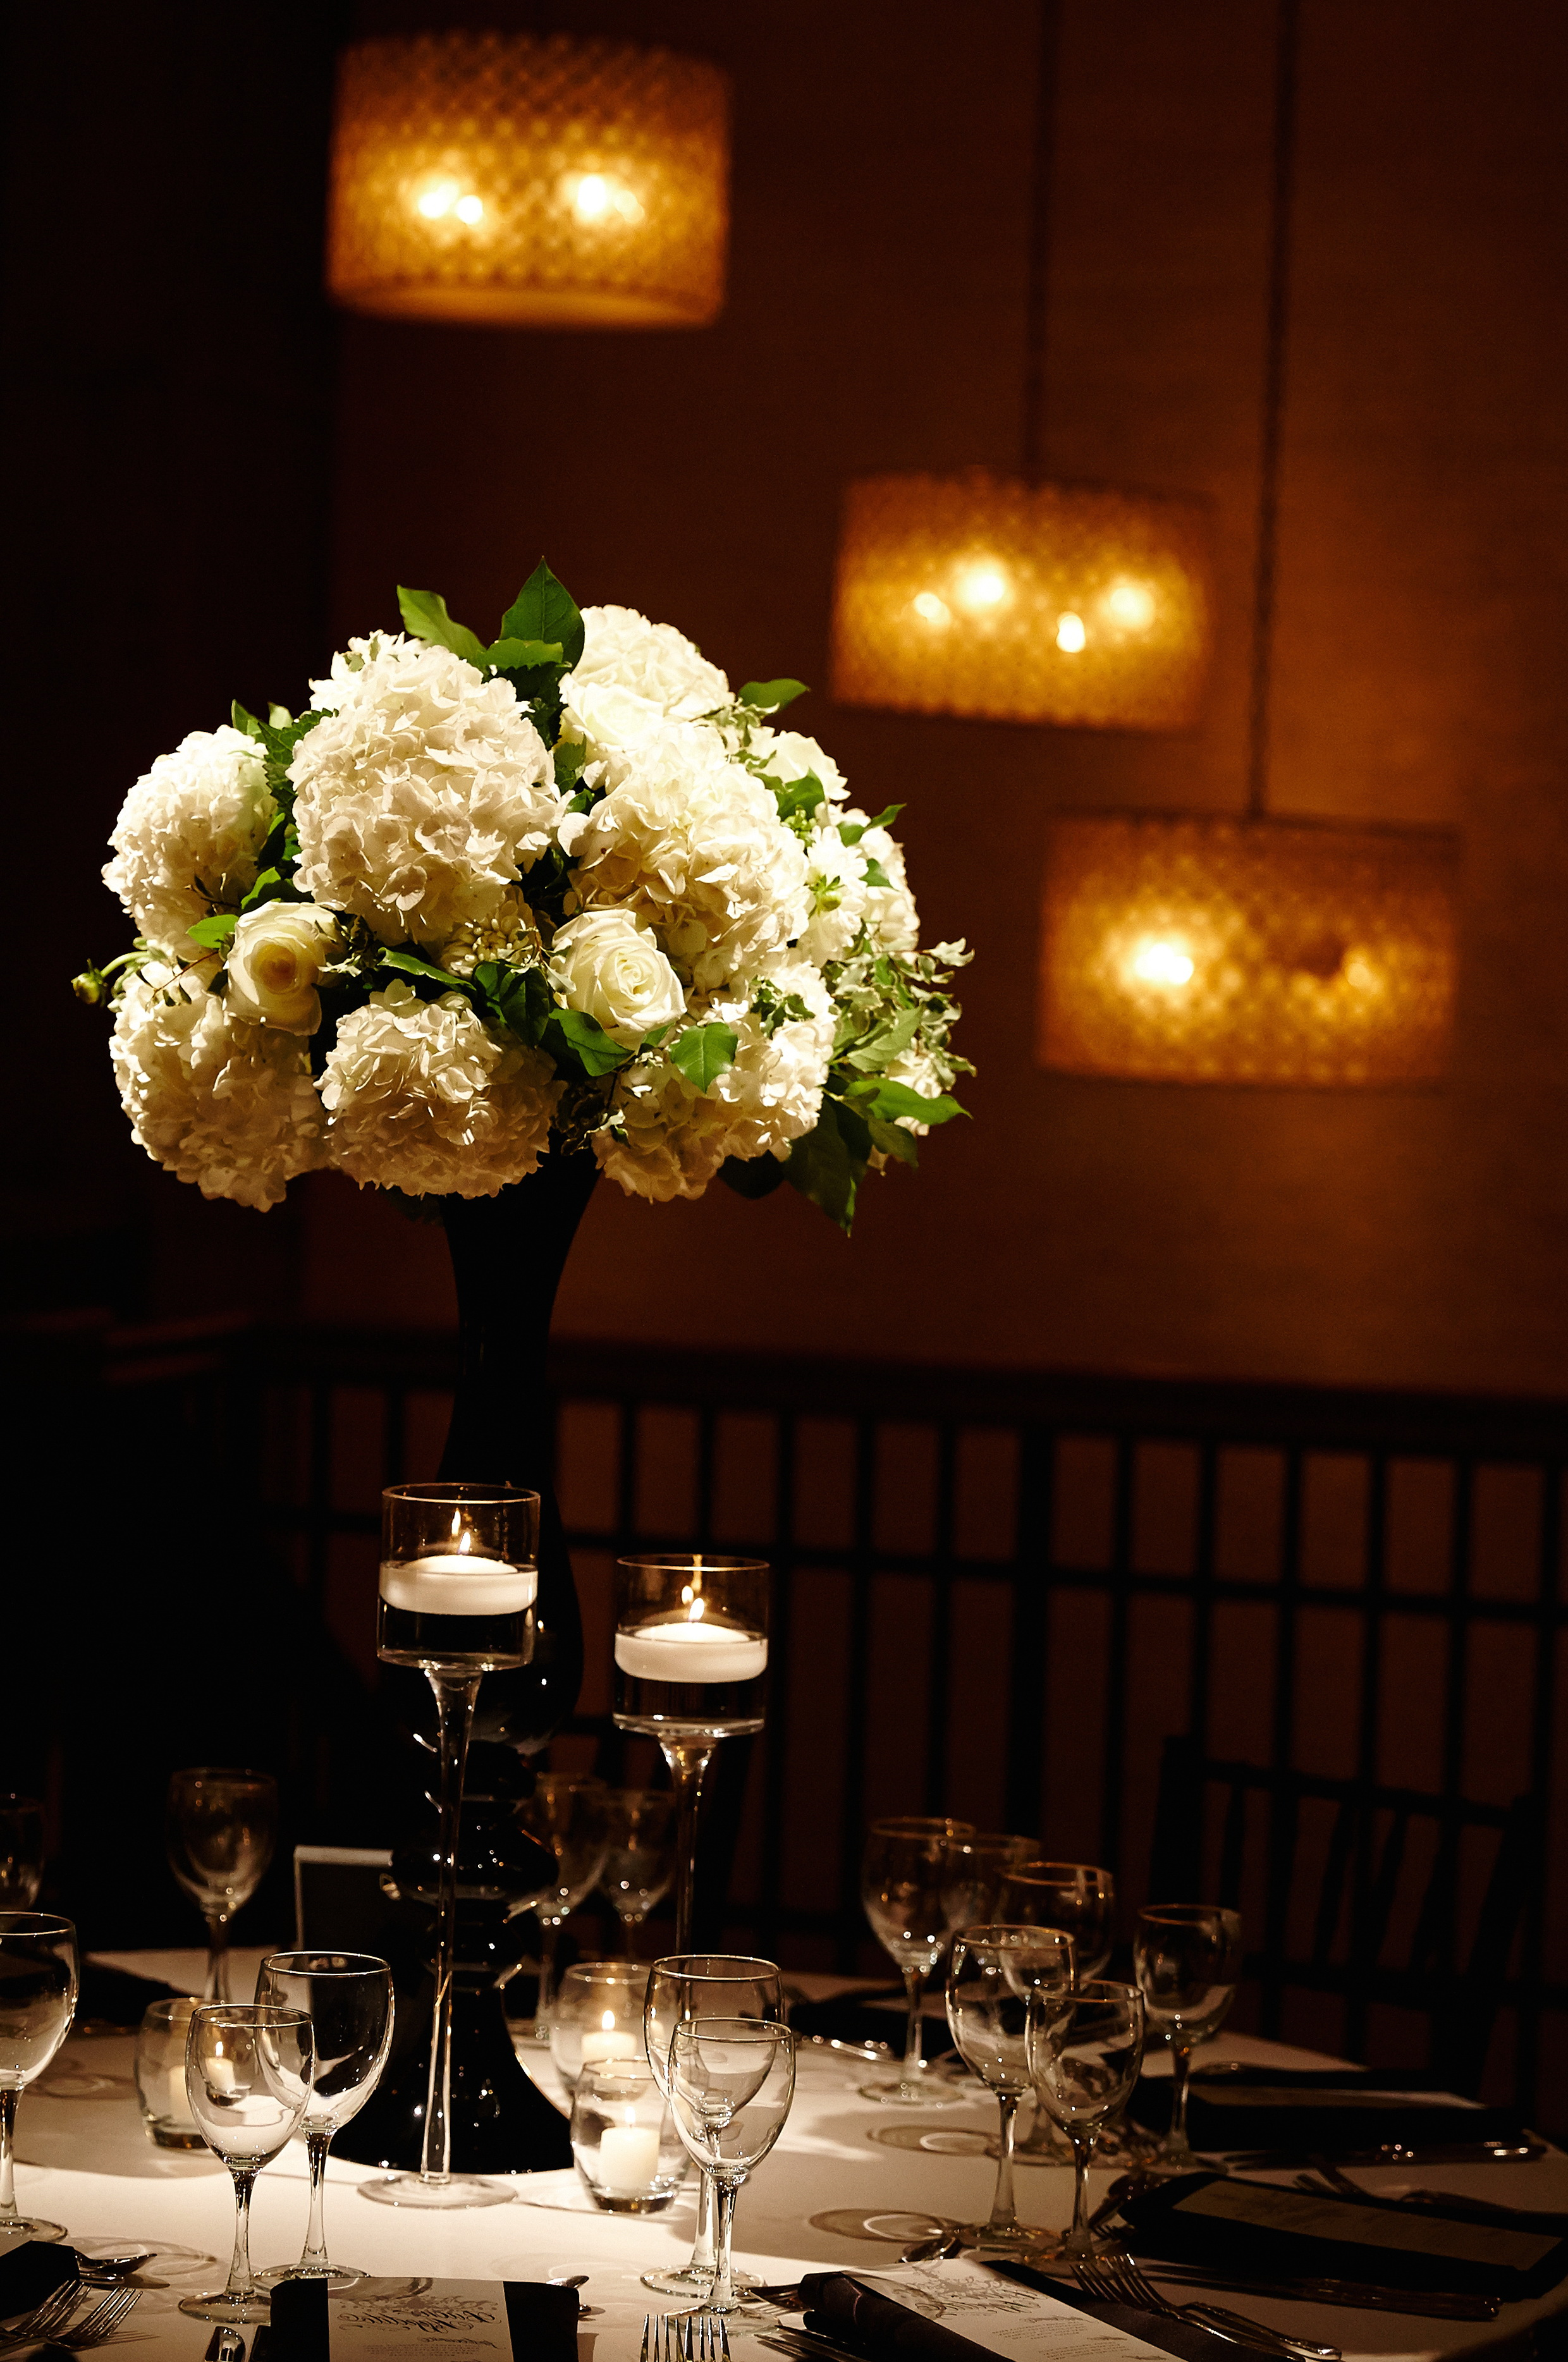 Black Vases For Centerpieces Home Design Ideas